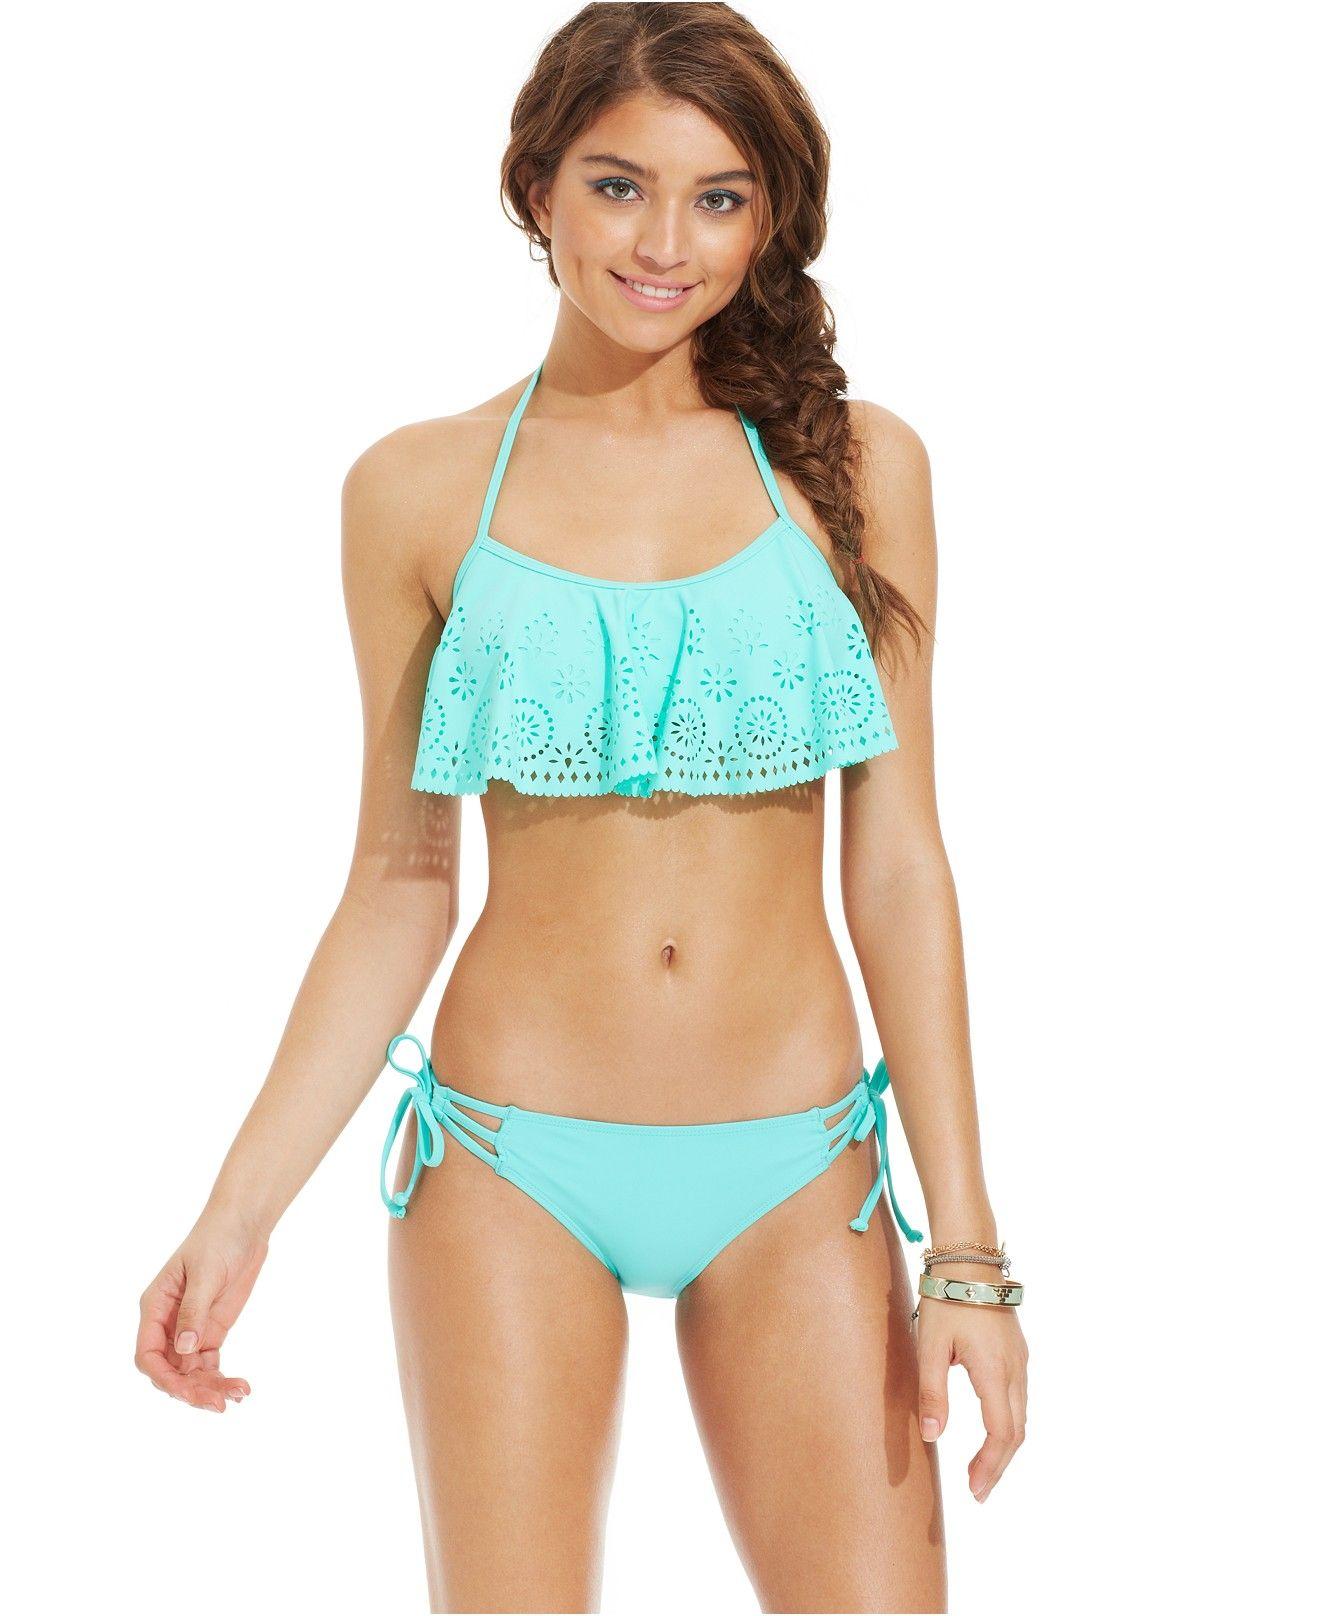 359fc3fe9da5c California Waves Laser-Cut Flounce Bikini Top & Side-Tie Bottom - Juniors  Swimwear - Macy's